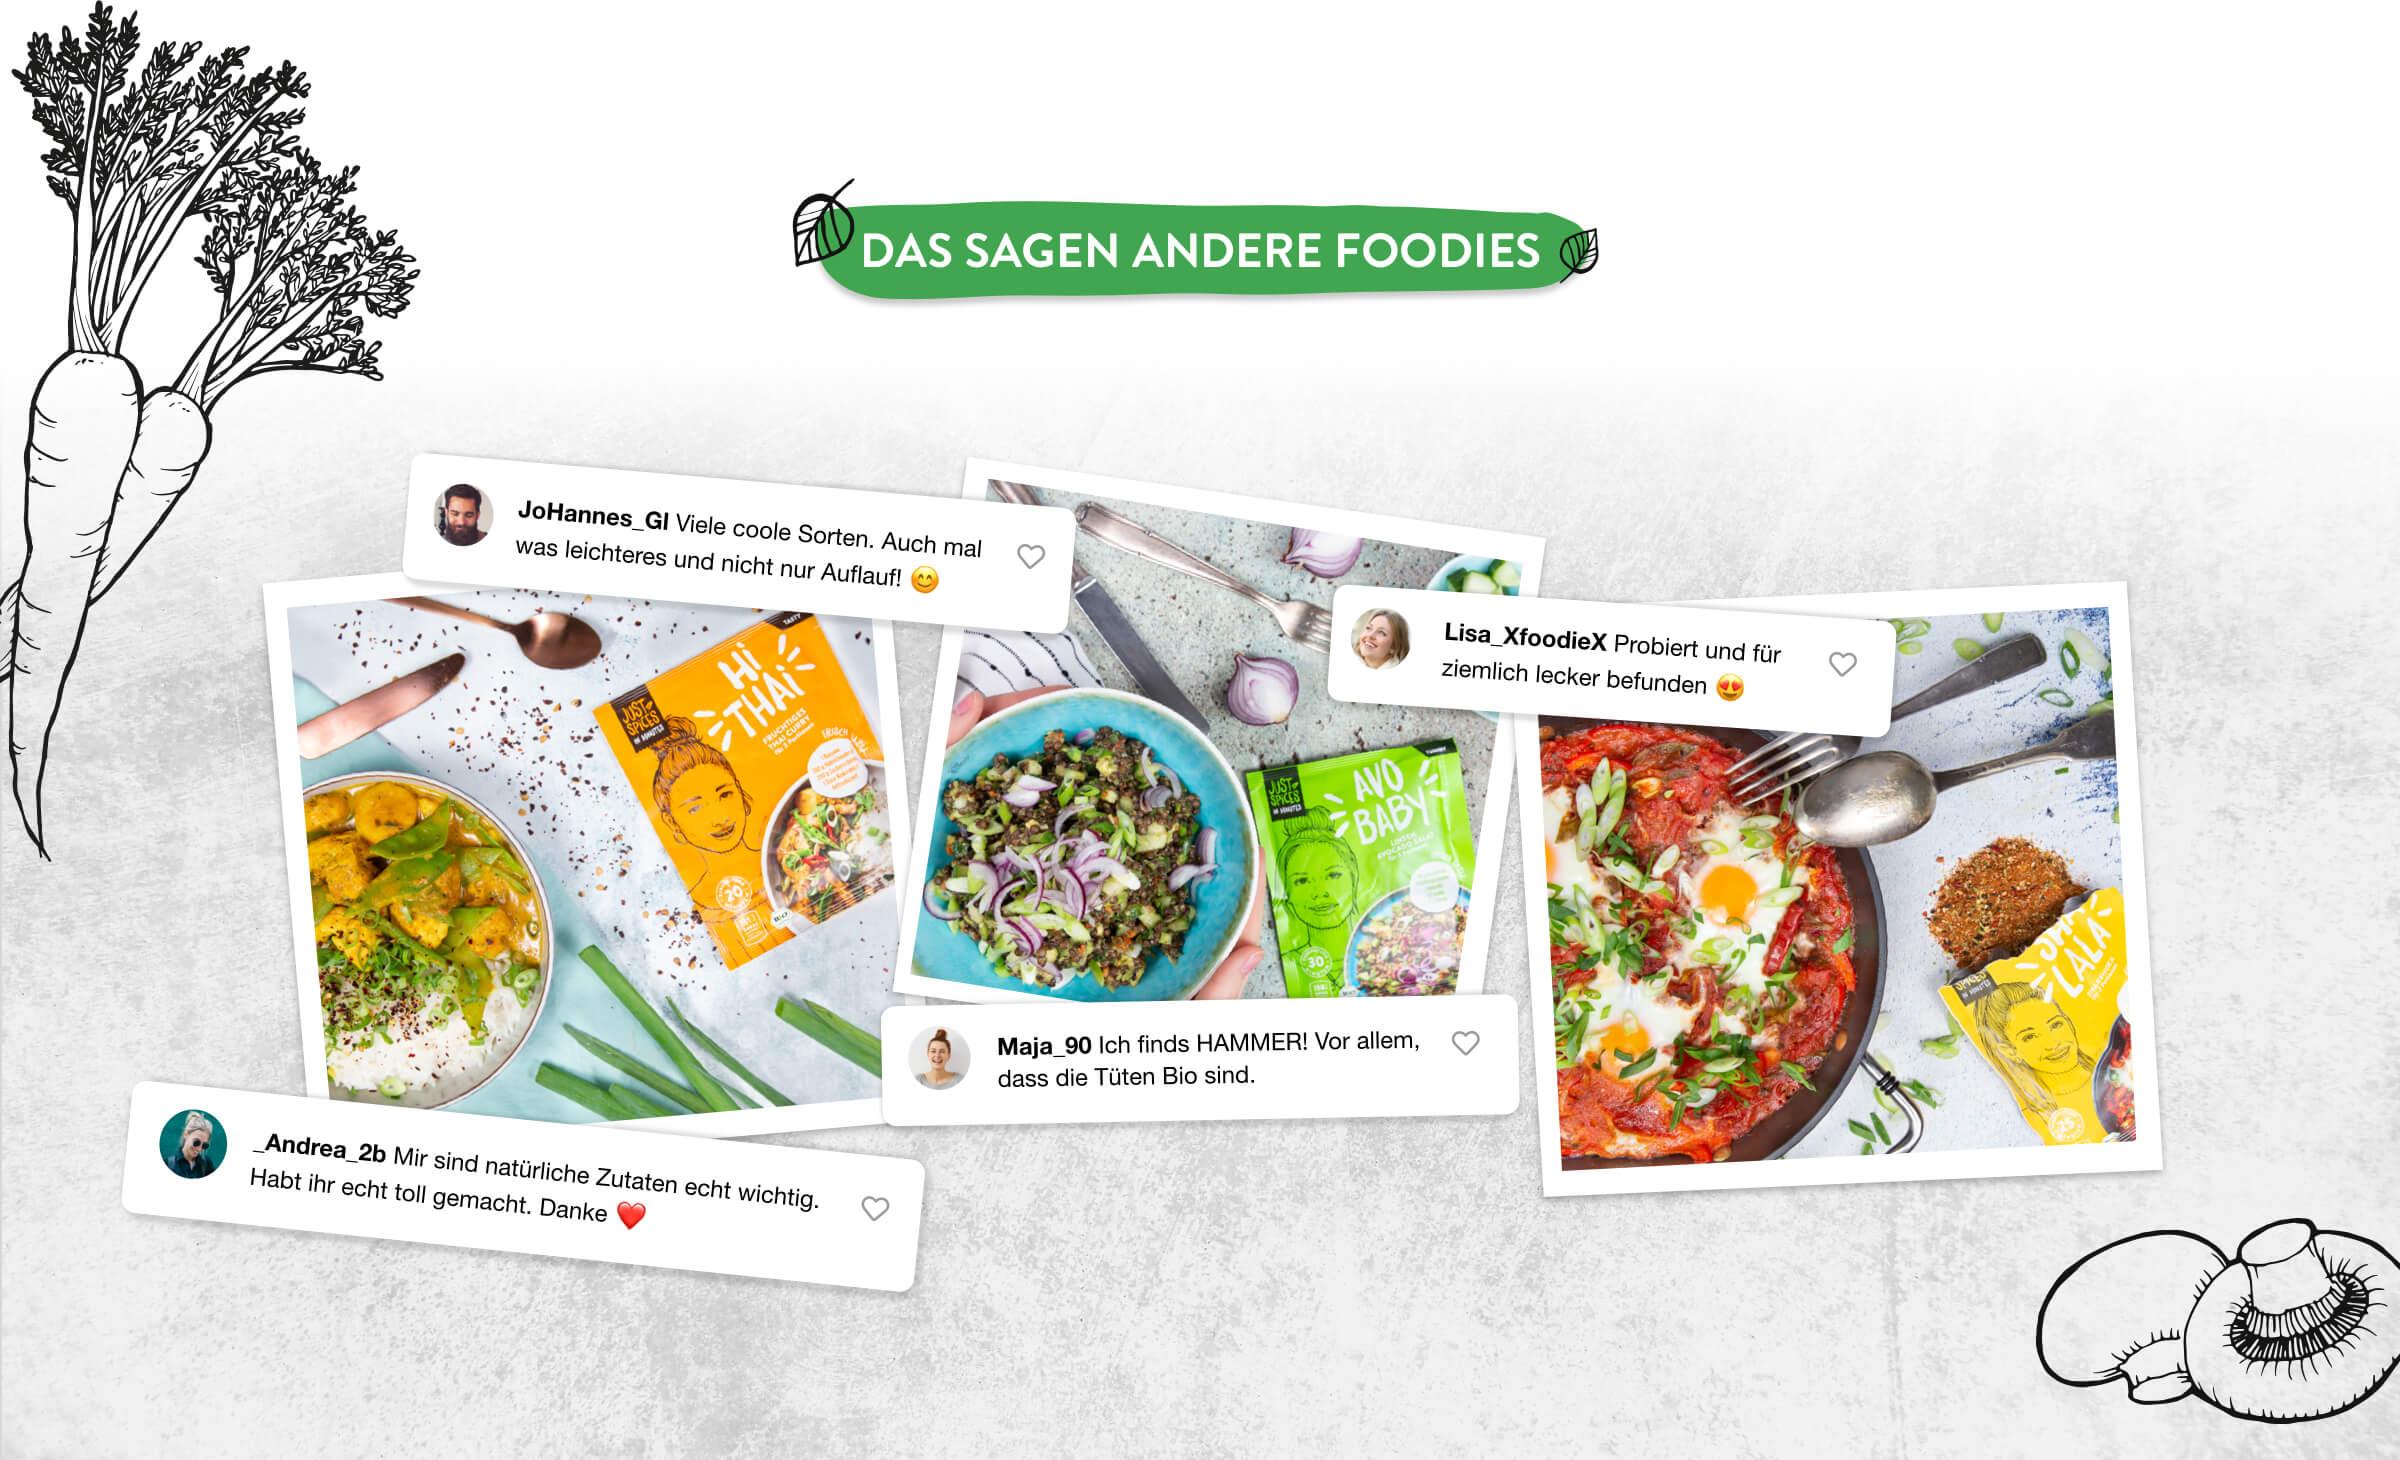 In Minutes - Das sagen andere Foodies